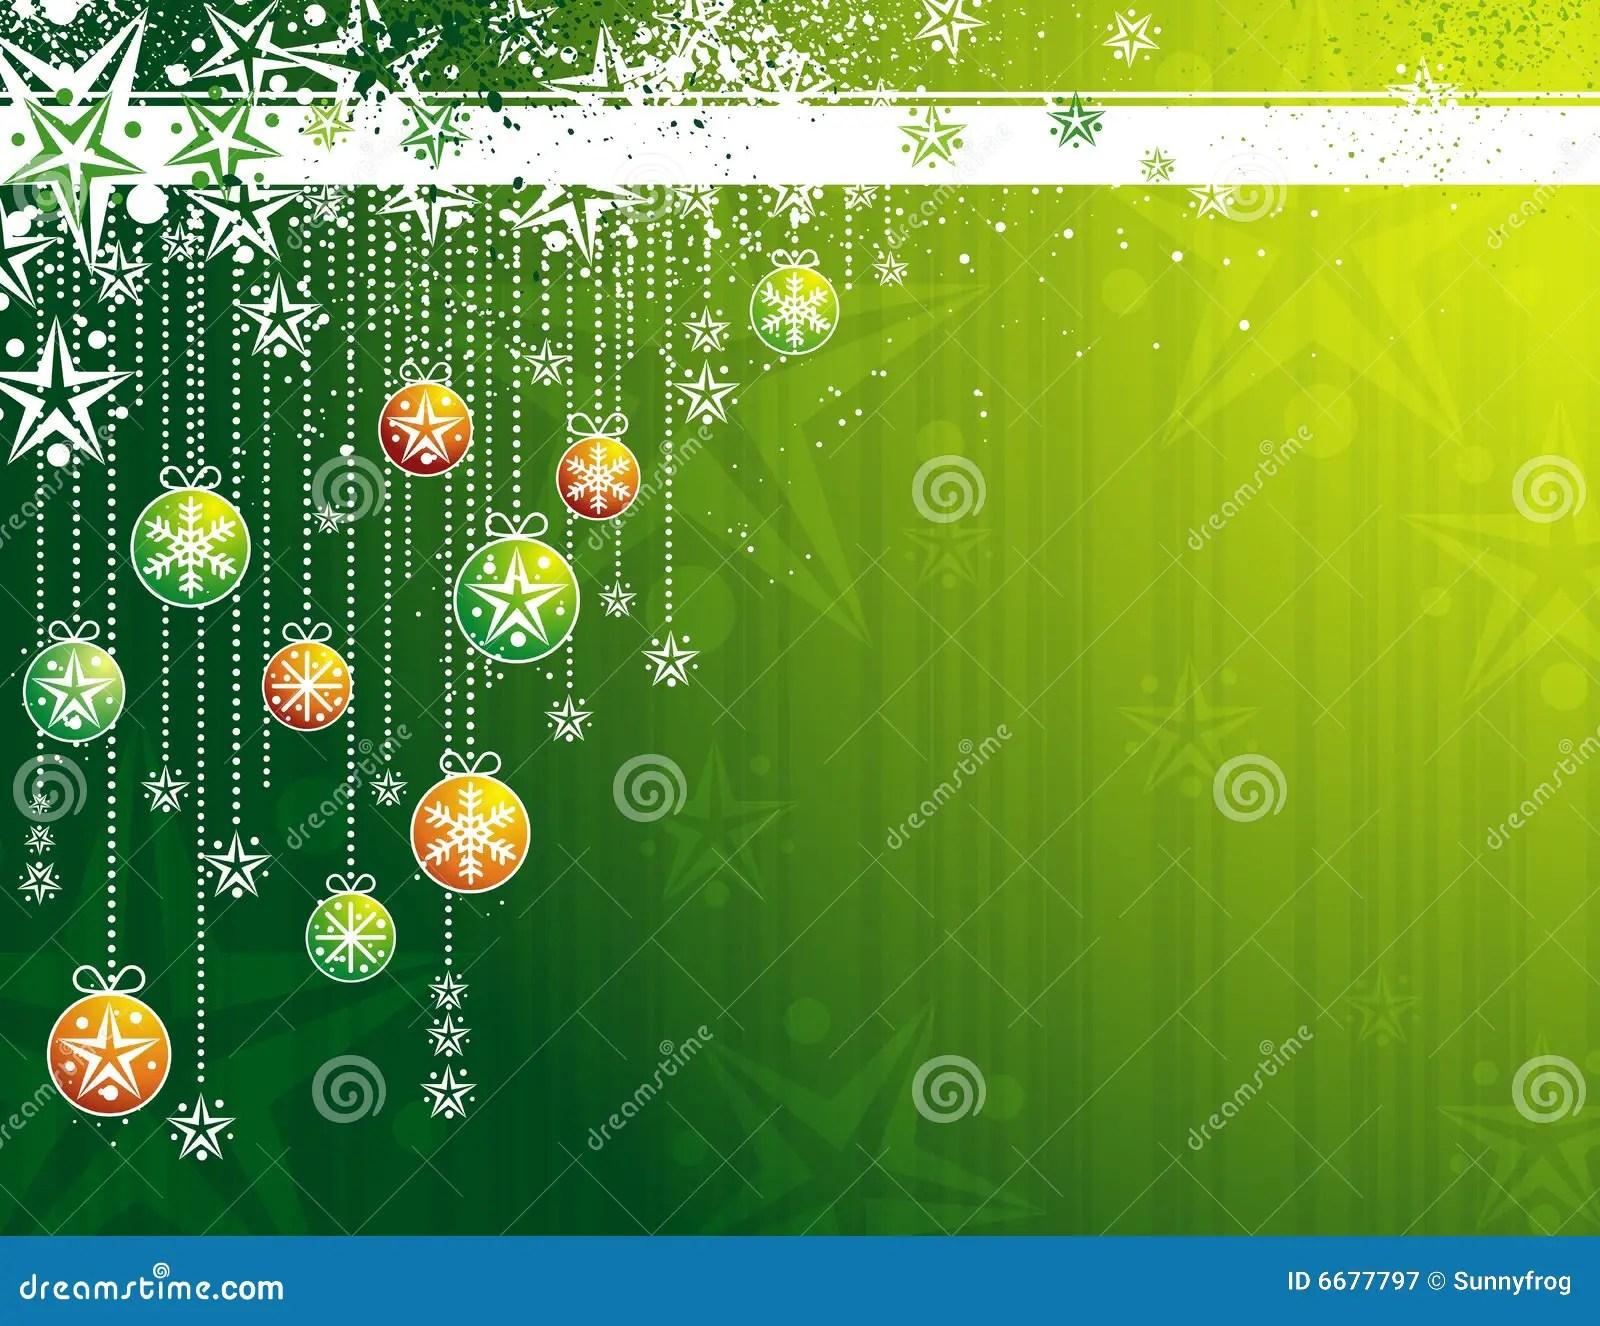 Christmas And New Year Greetings Galleries Marhaban Ya